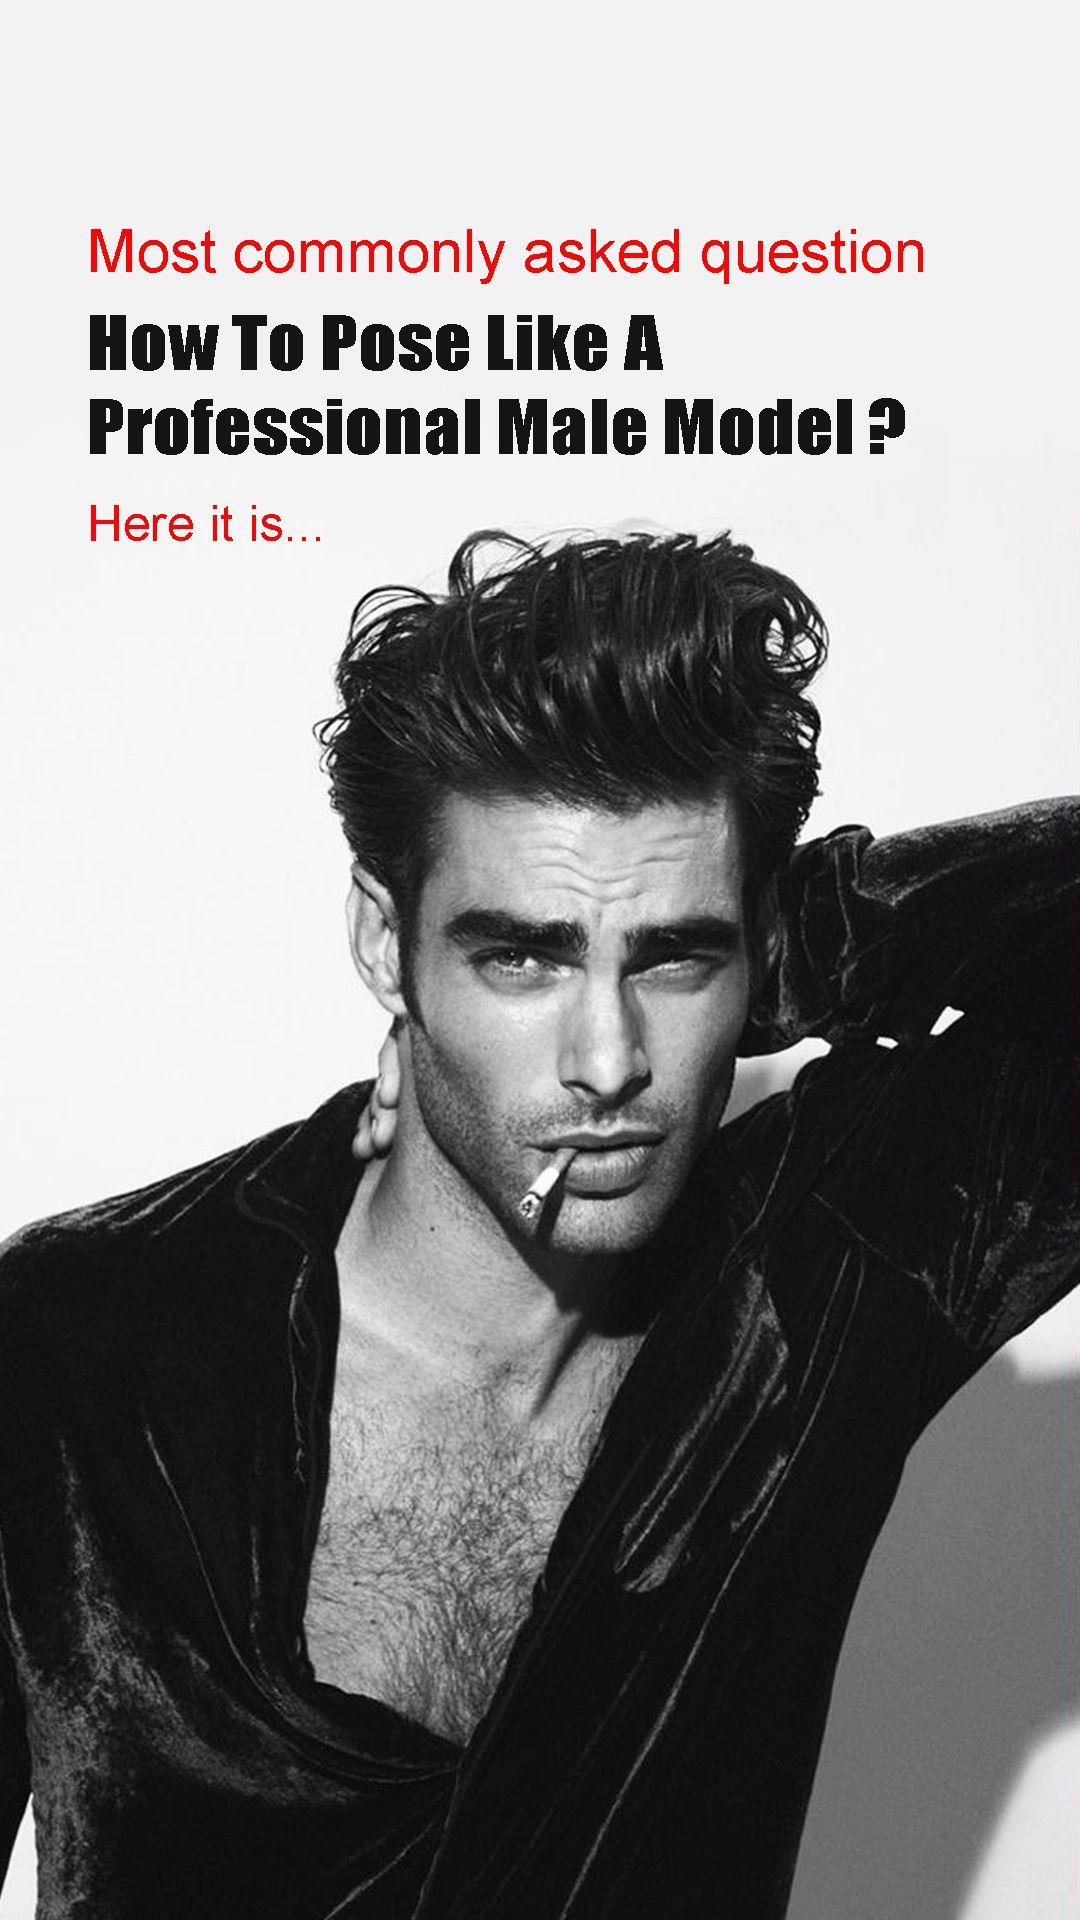 d4a0de7c90414d733d6d0bdb724738cc - How To Get A Job As A Male Model